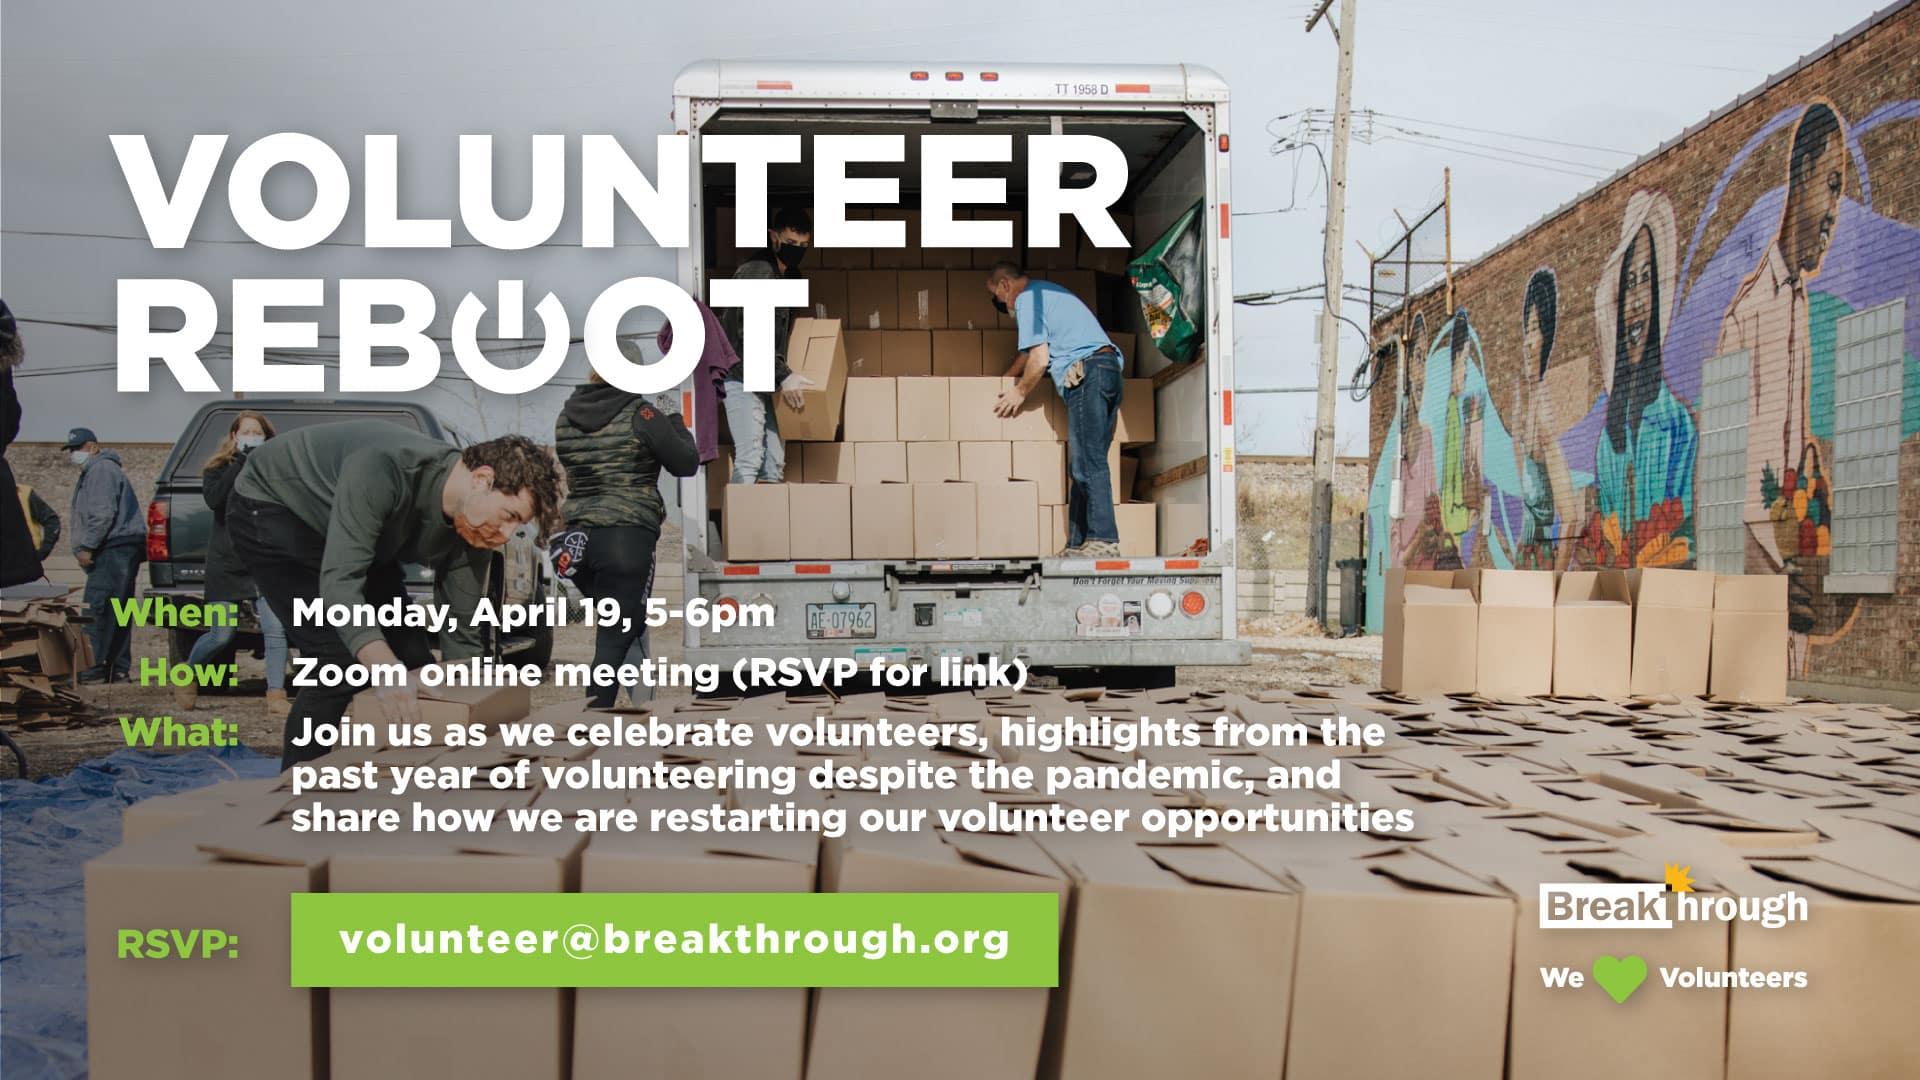 Volunteer Reboot 2